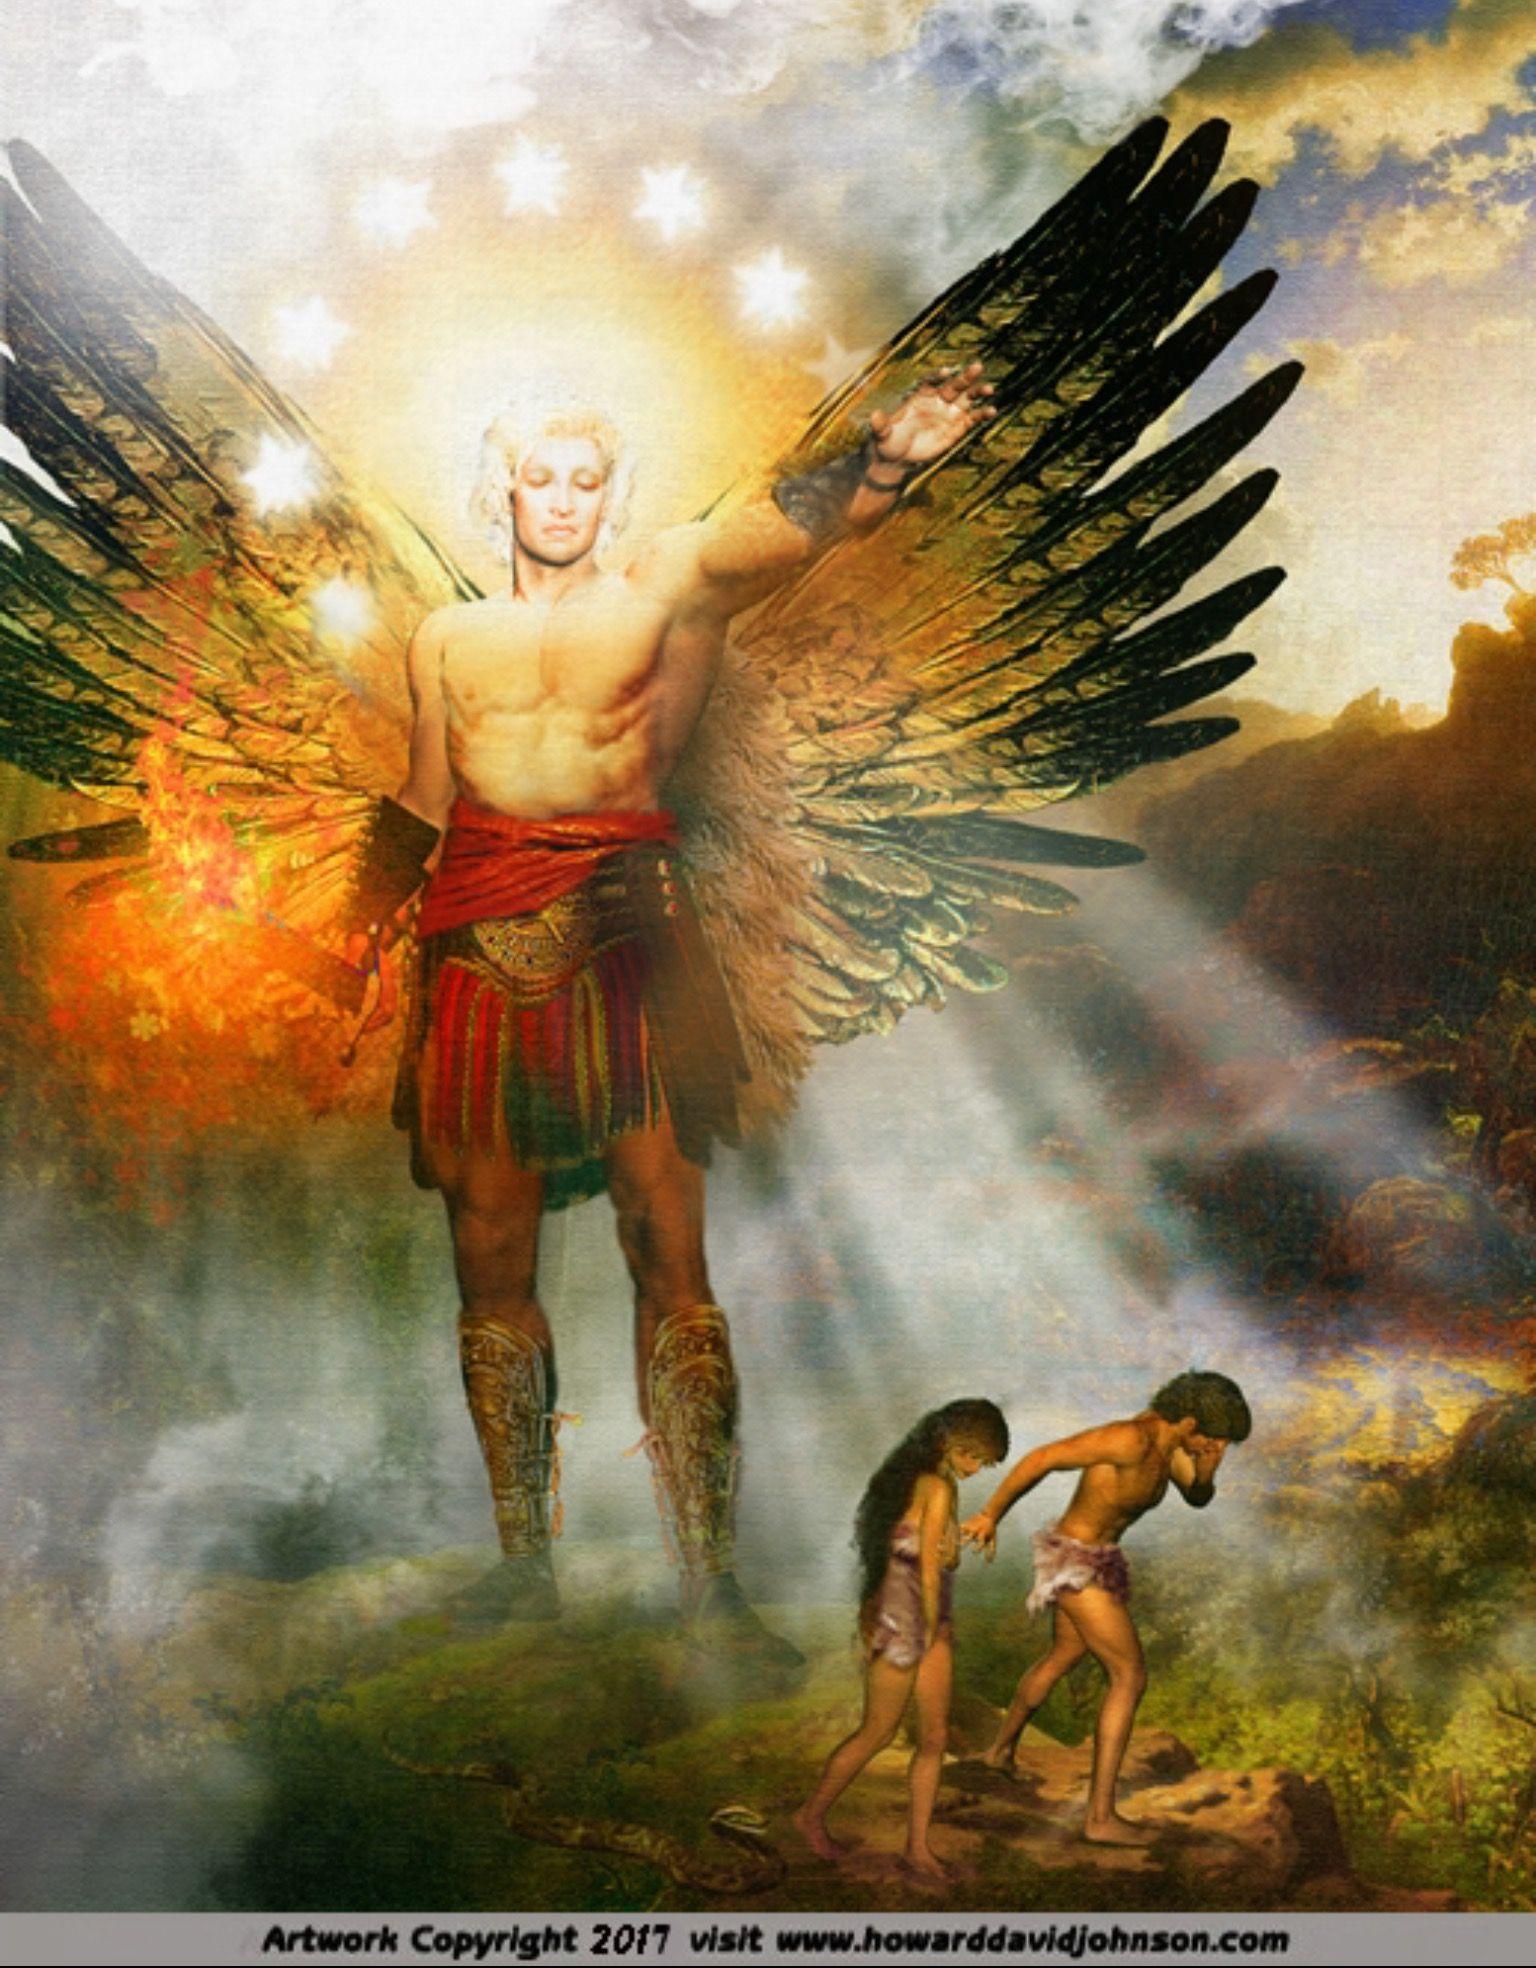 Adam And Eve Expelled From The Garden Of Eden. Genesis 3:23-24 KJV ...